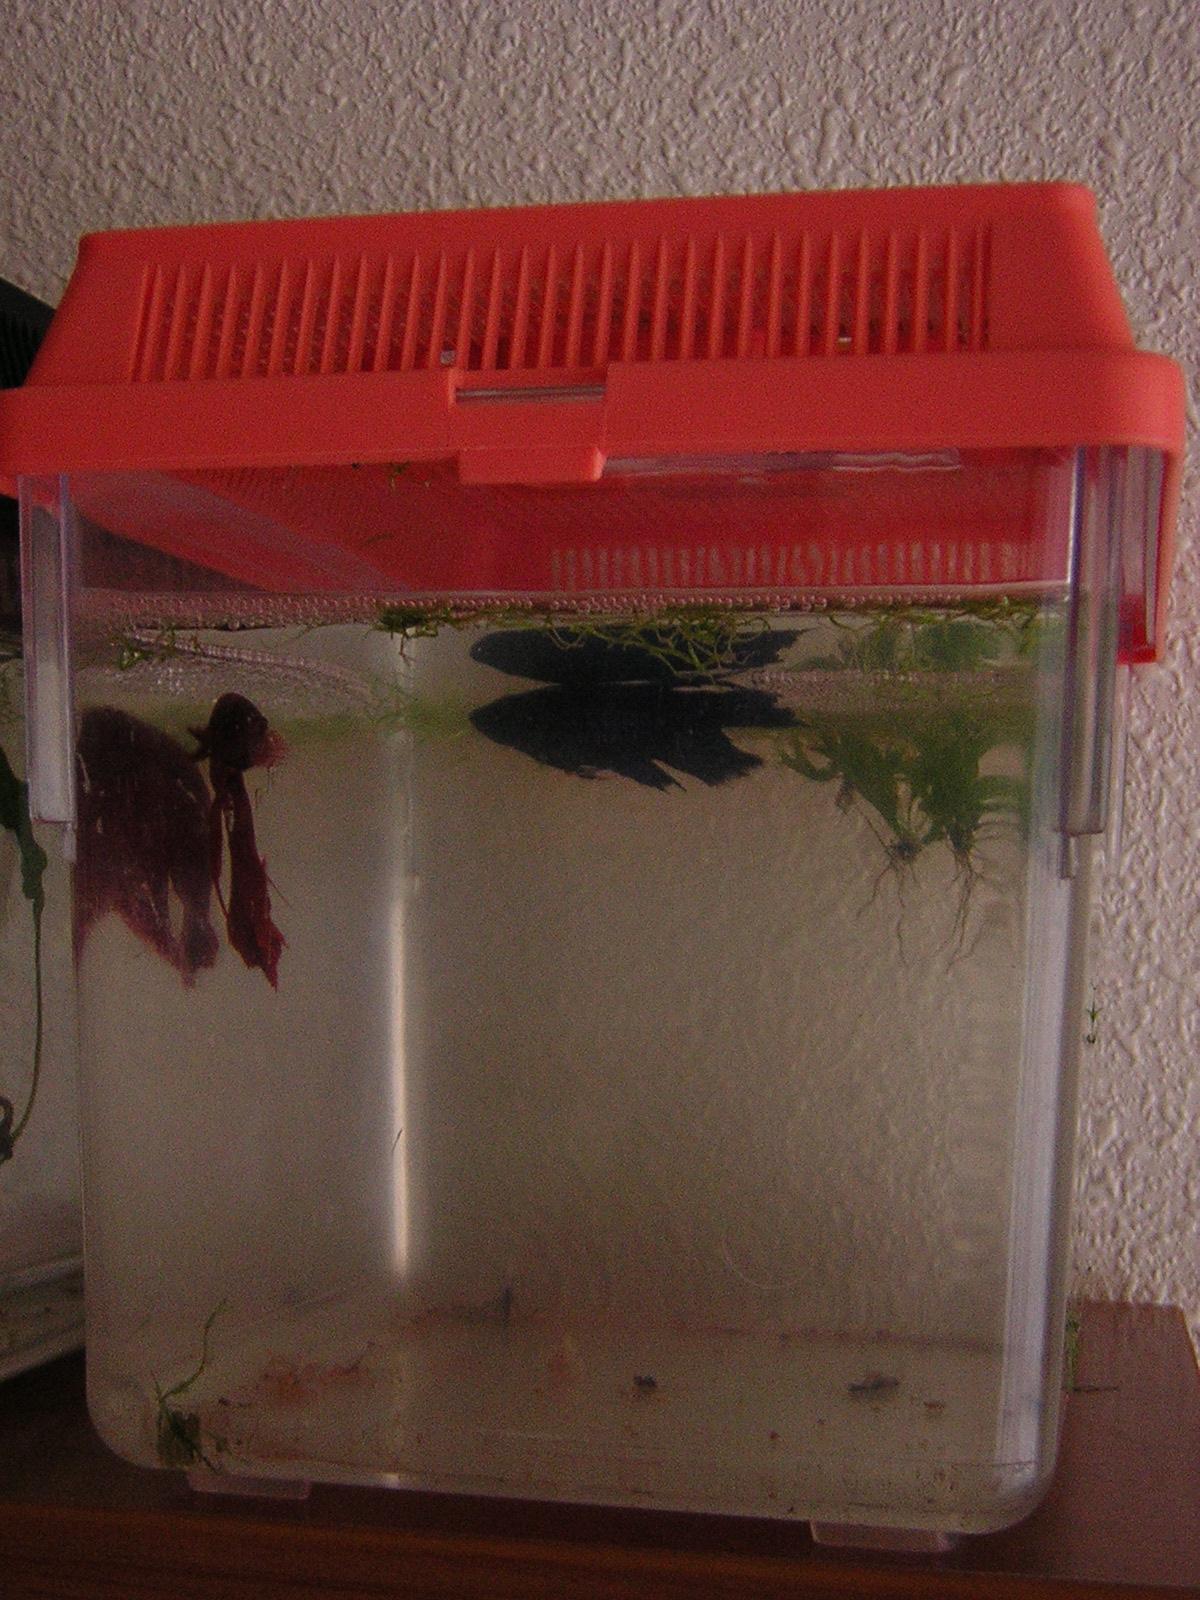 Pareja de Betta Splendens en fase de compartir acuario